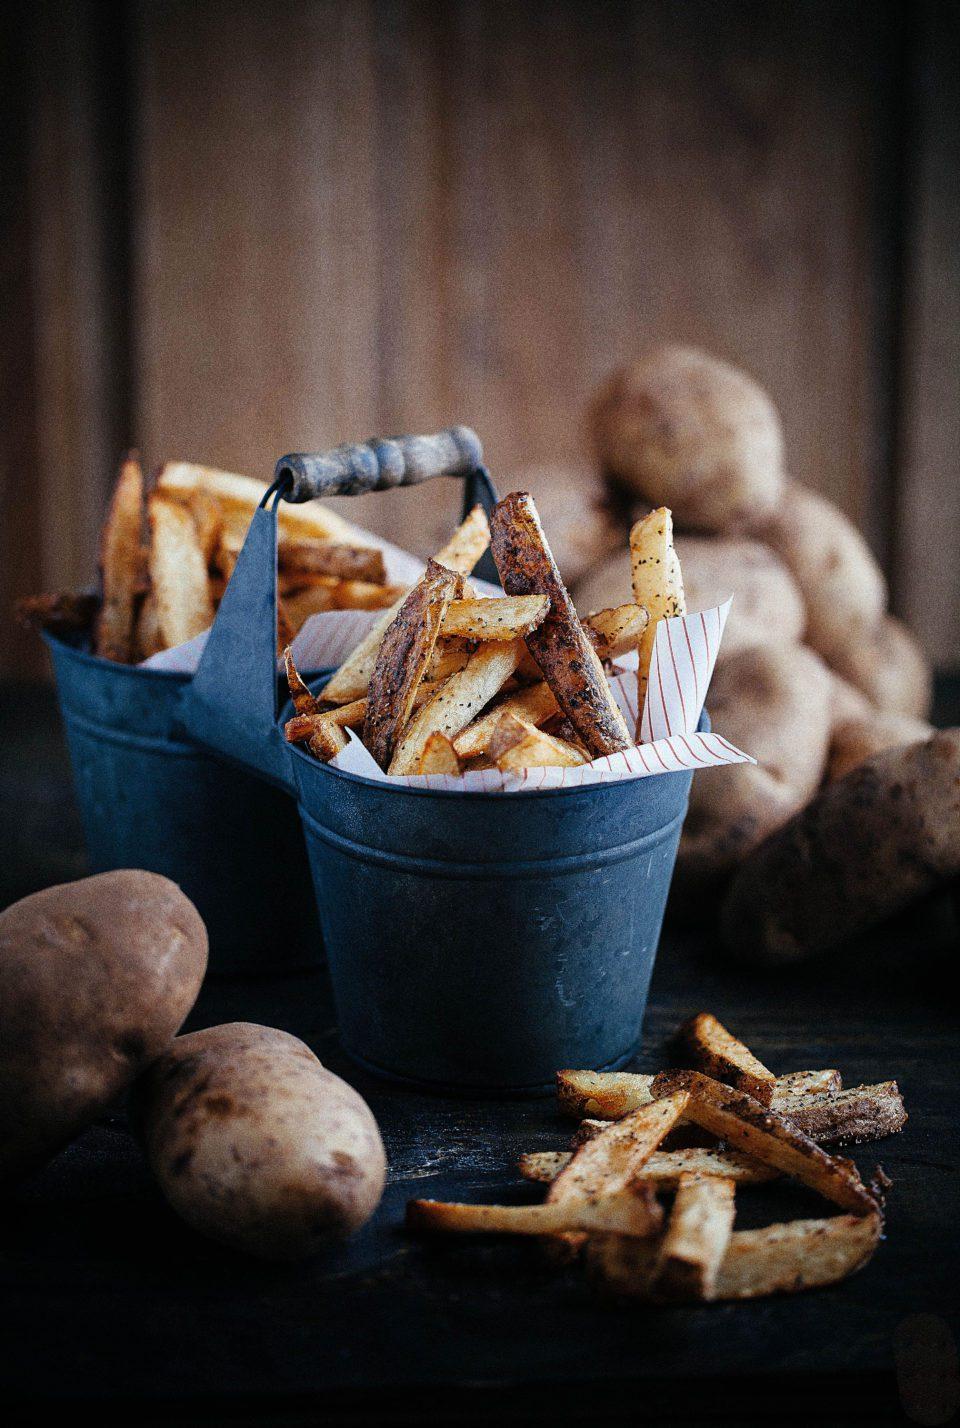 idaho-potatoes-960x1428 Celebrate Creativity with a Stylish Midlothian, VA Blogger & DIYer